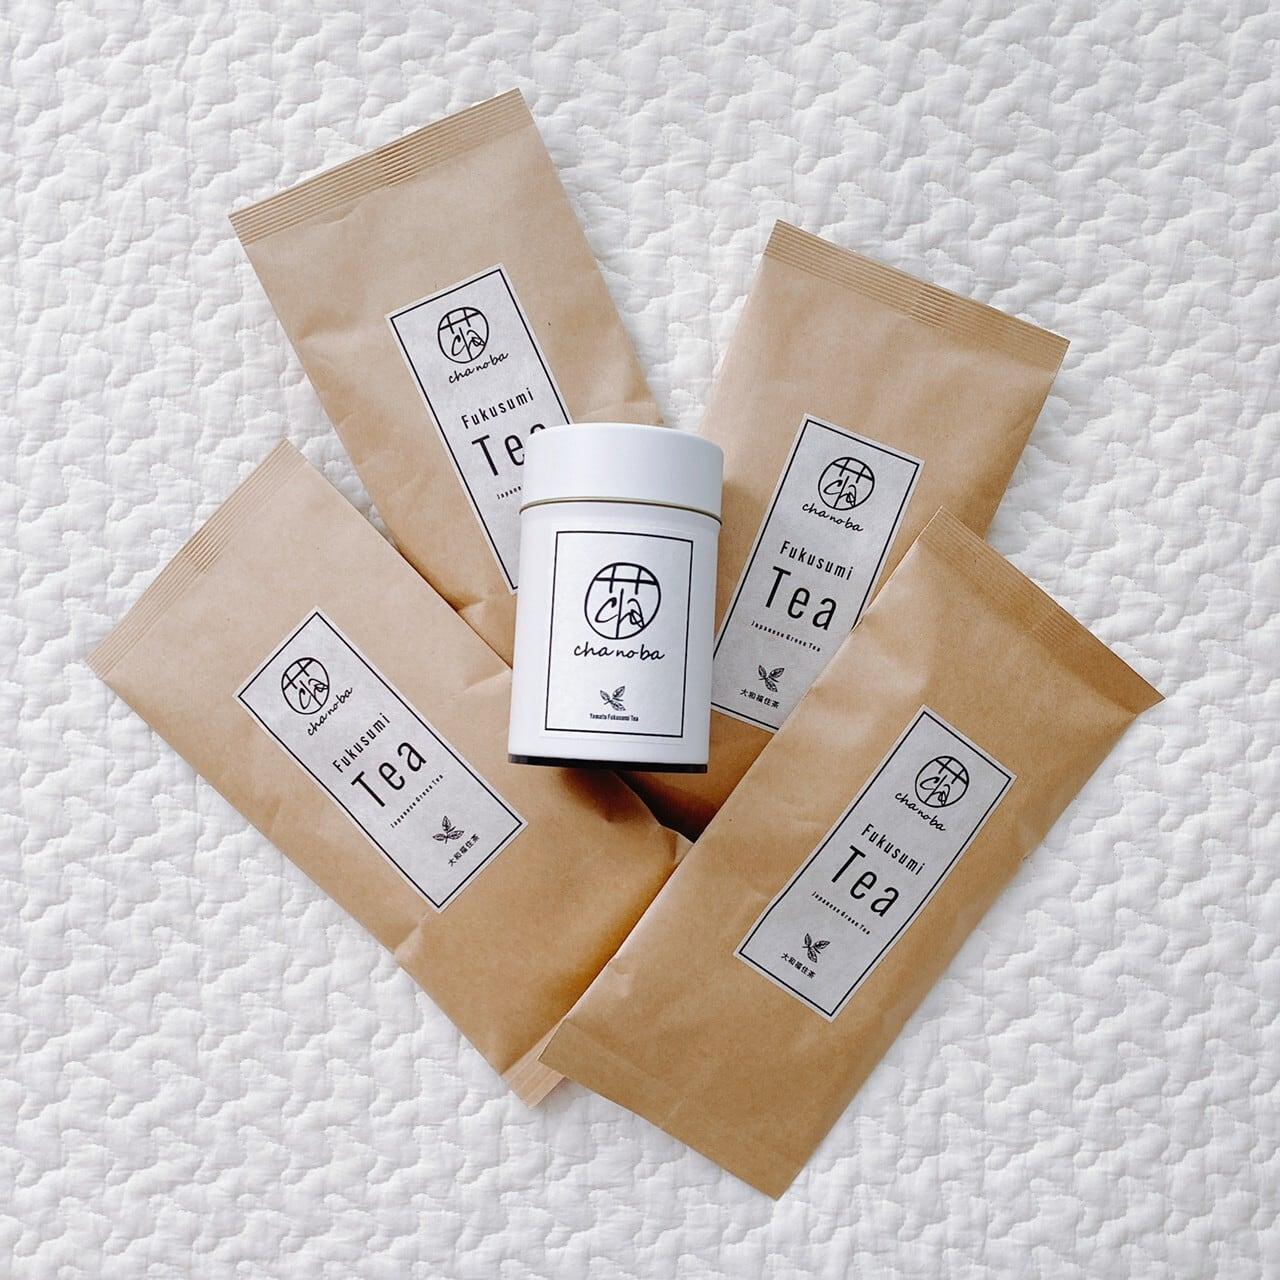 大和福住茶 4本+茶缶セット【送料無料】